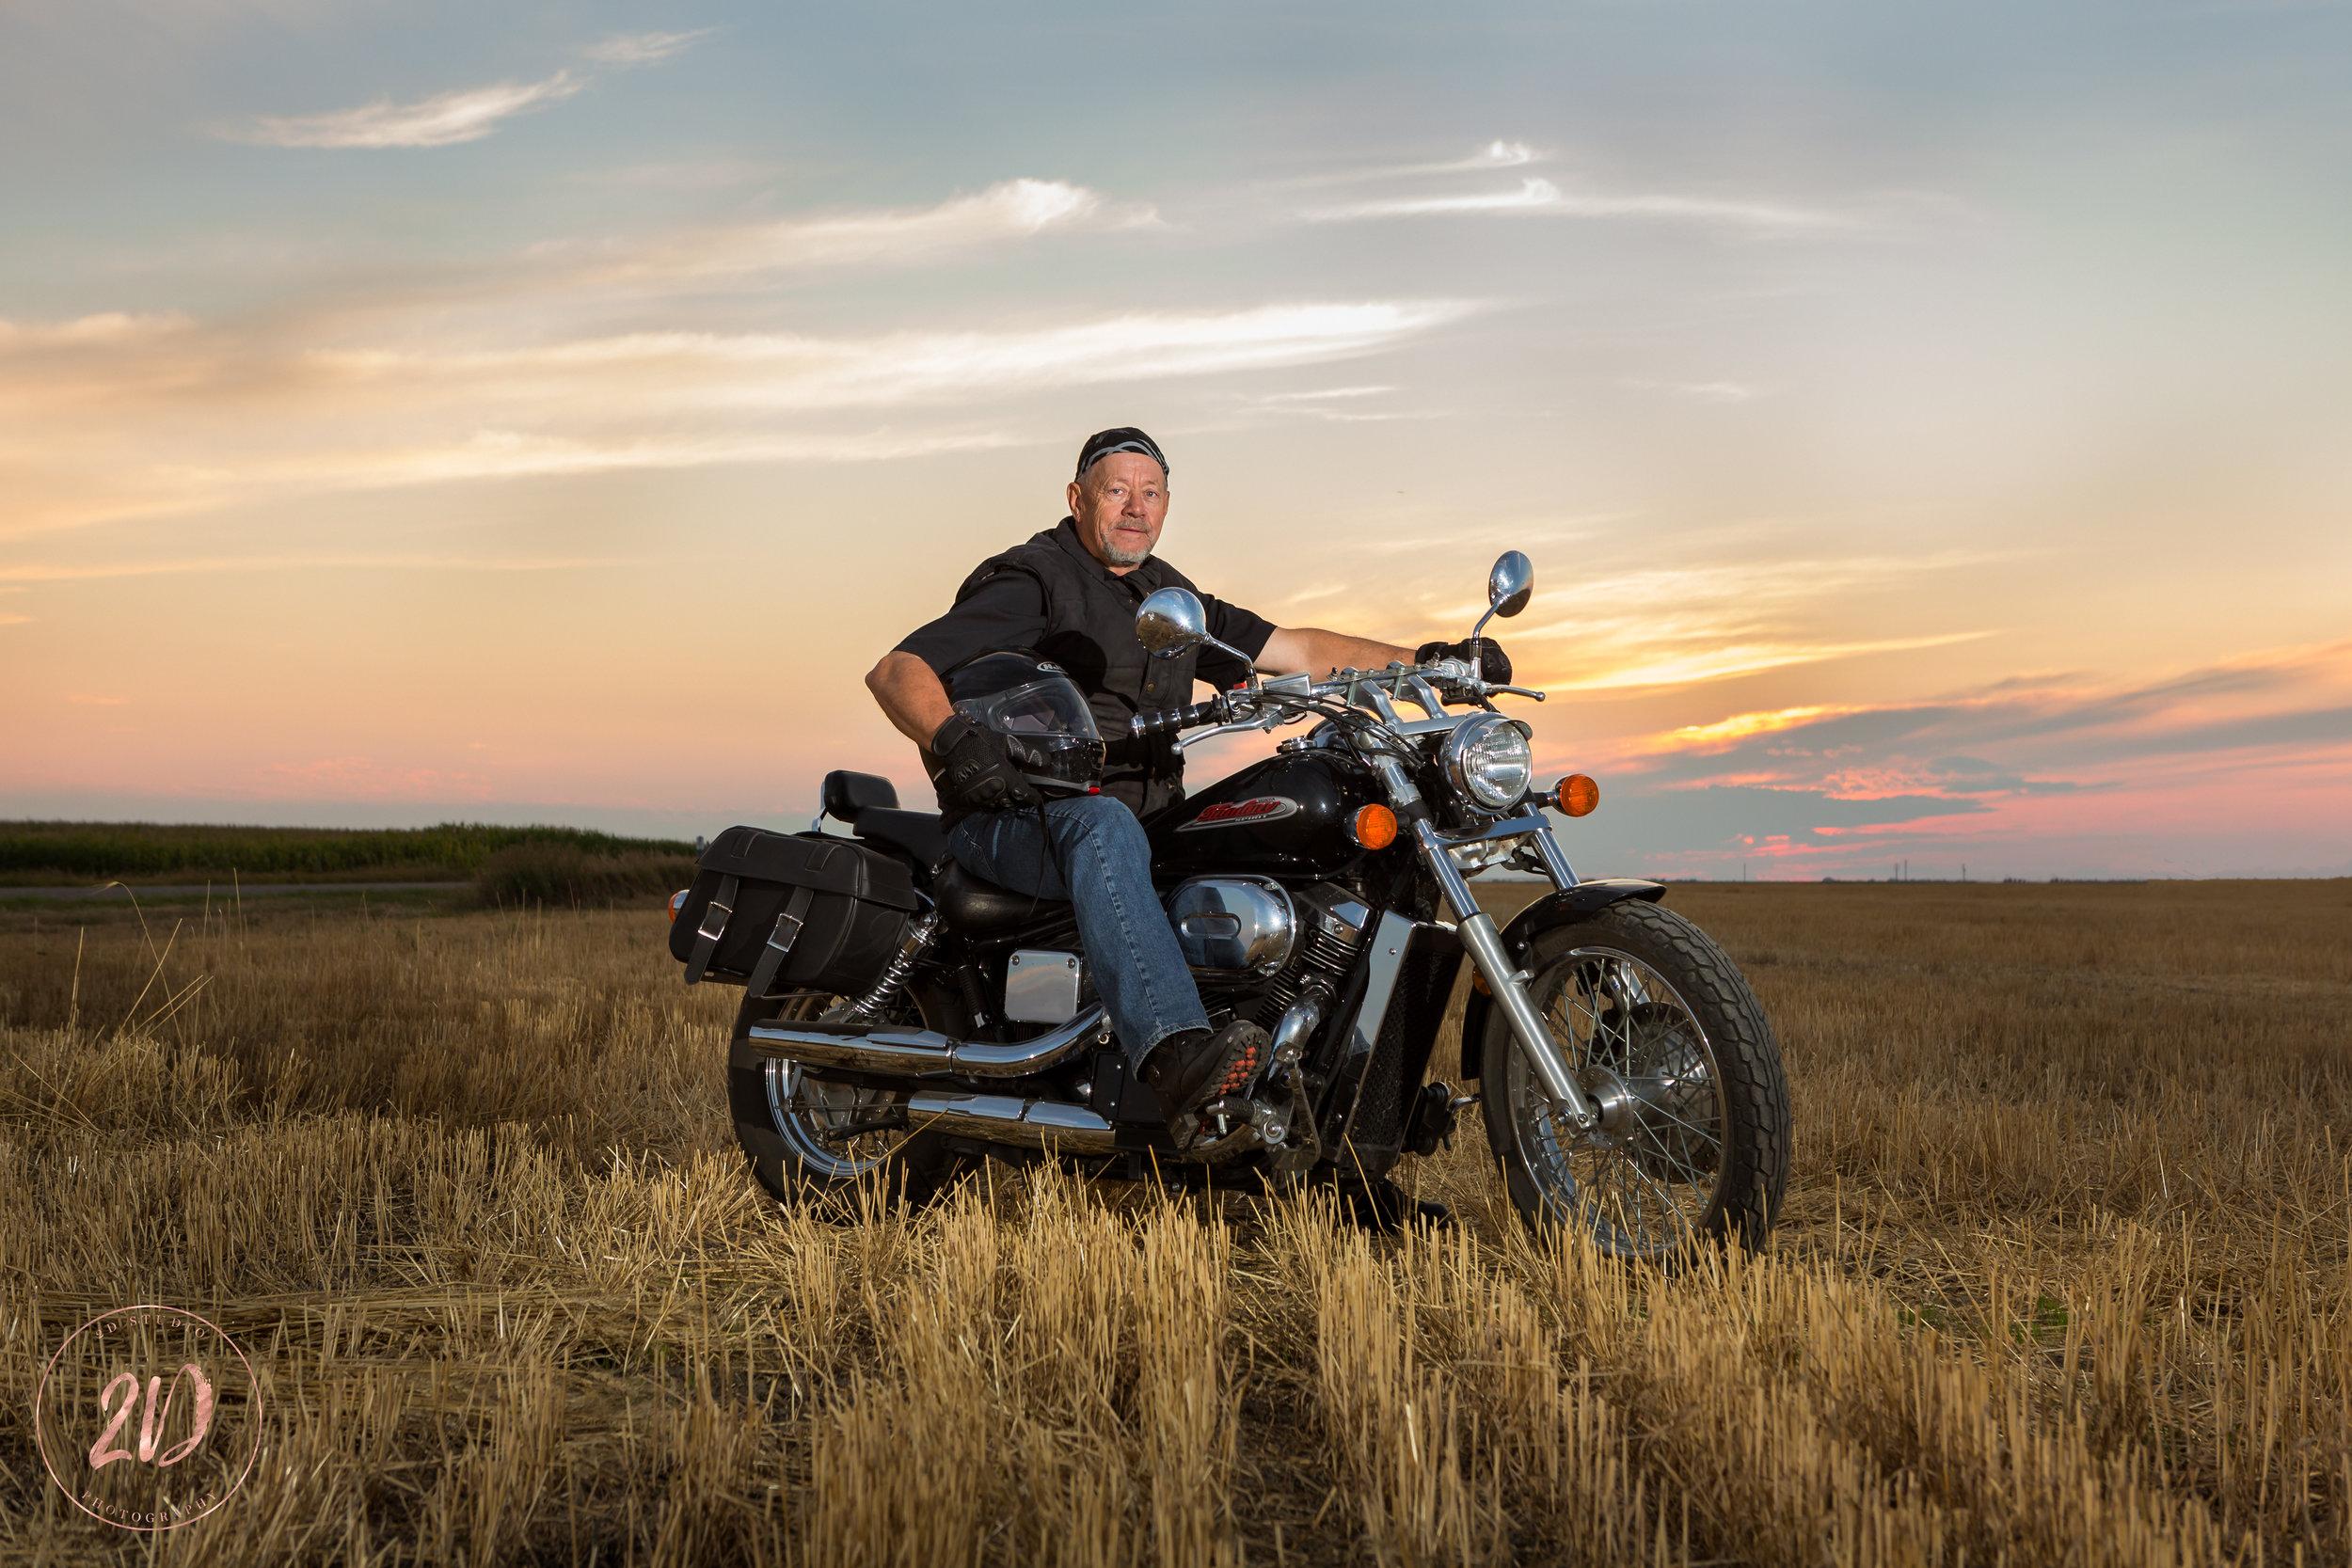 Motorcycle_Portrait_Lethbridge_Sunset_Field_Photographer